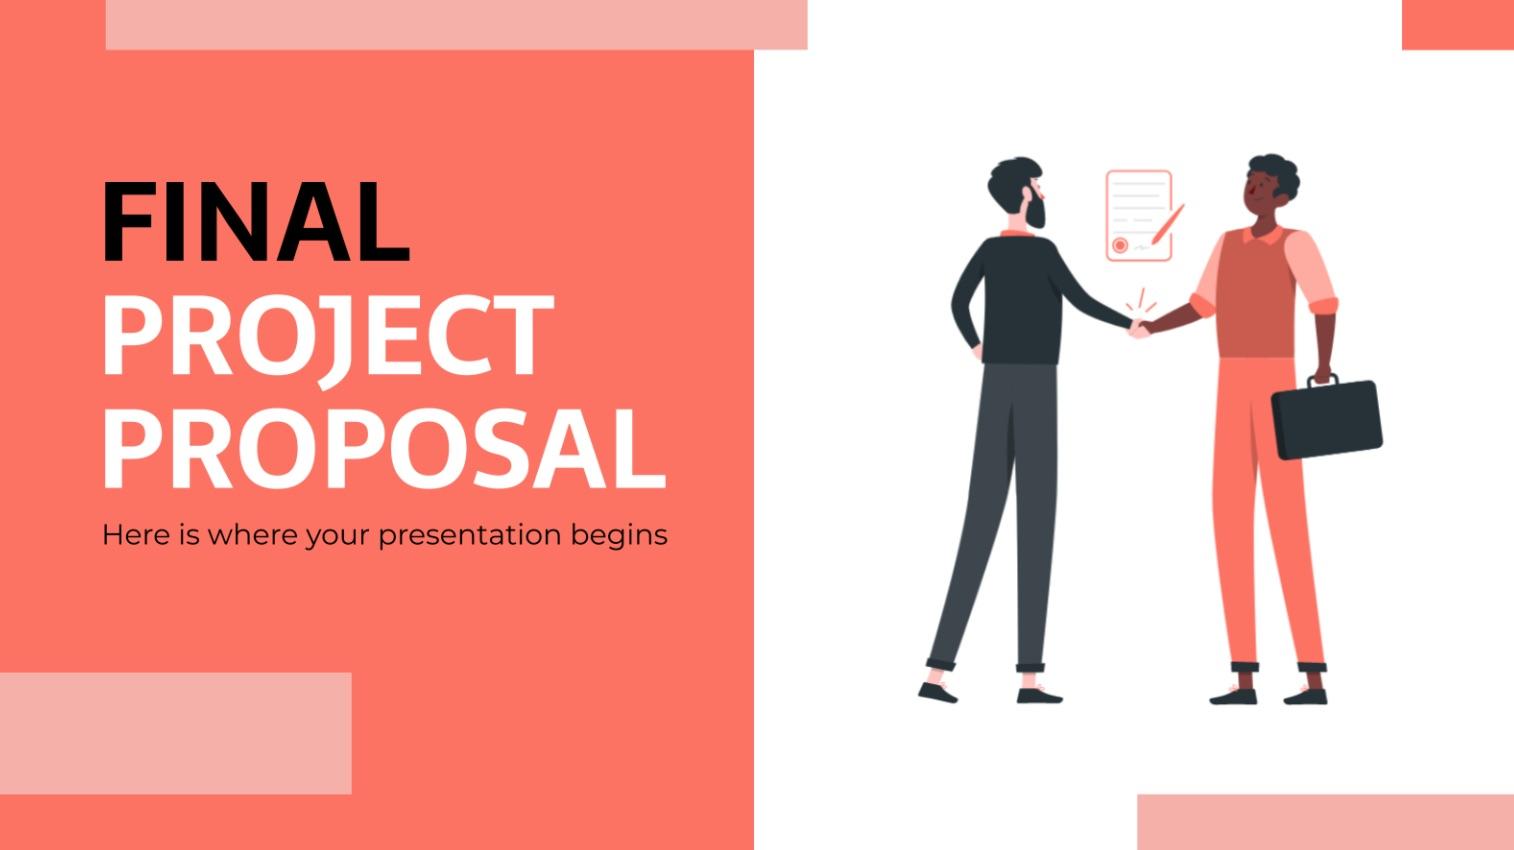 Final Project Proposal, plantilla de PowerPoint animada gratis